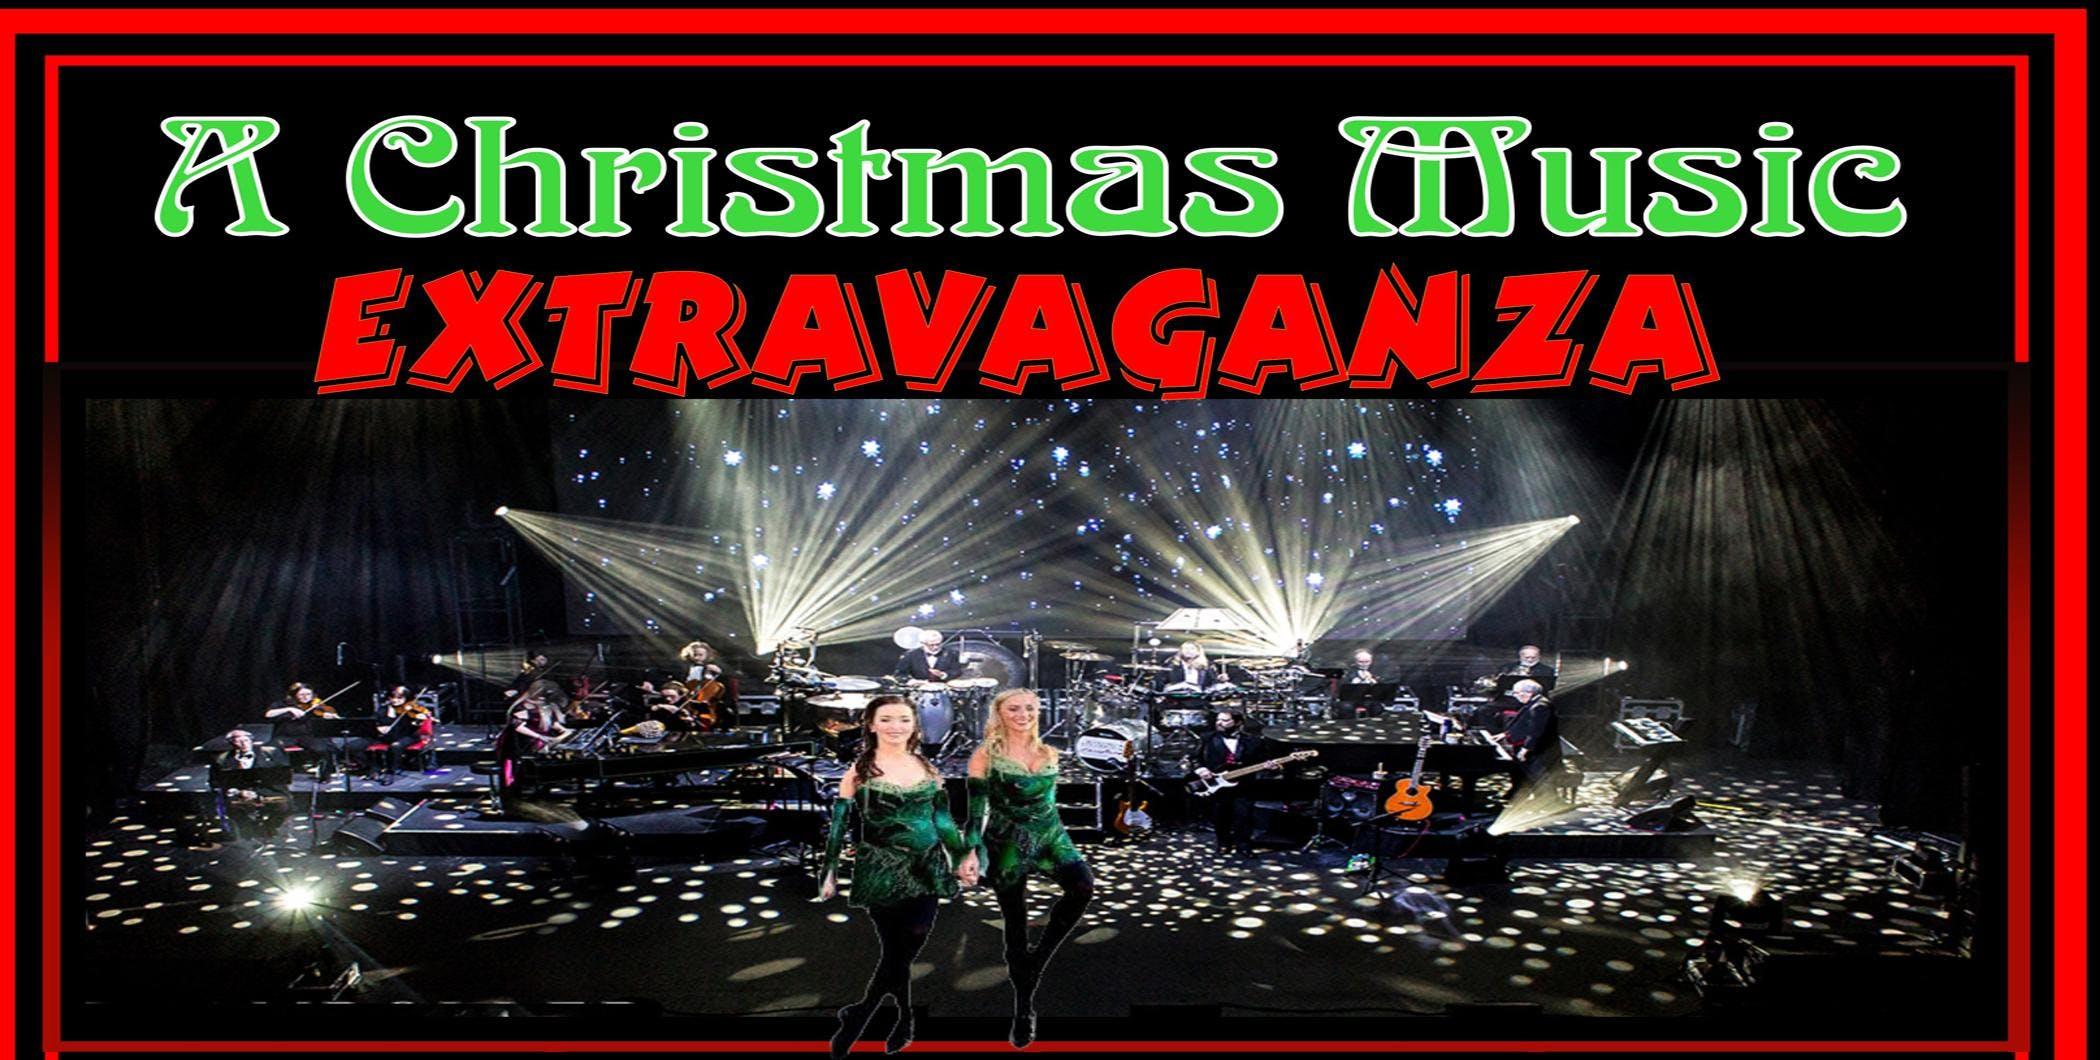 Christmas Music Extravaganza